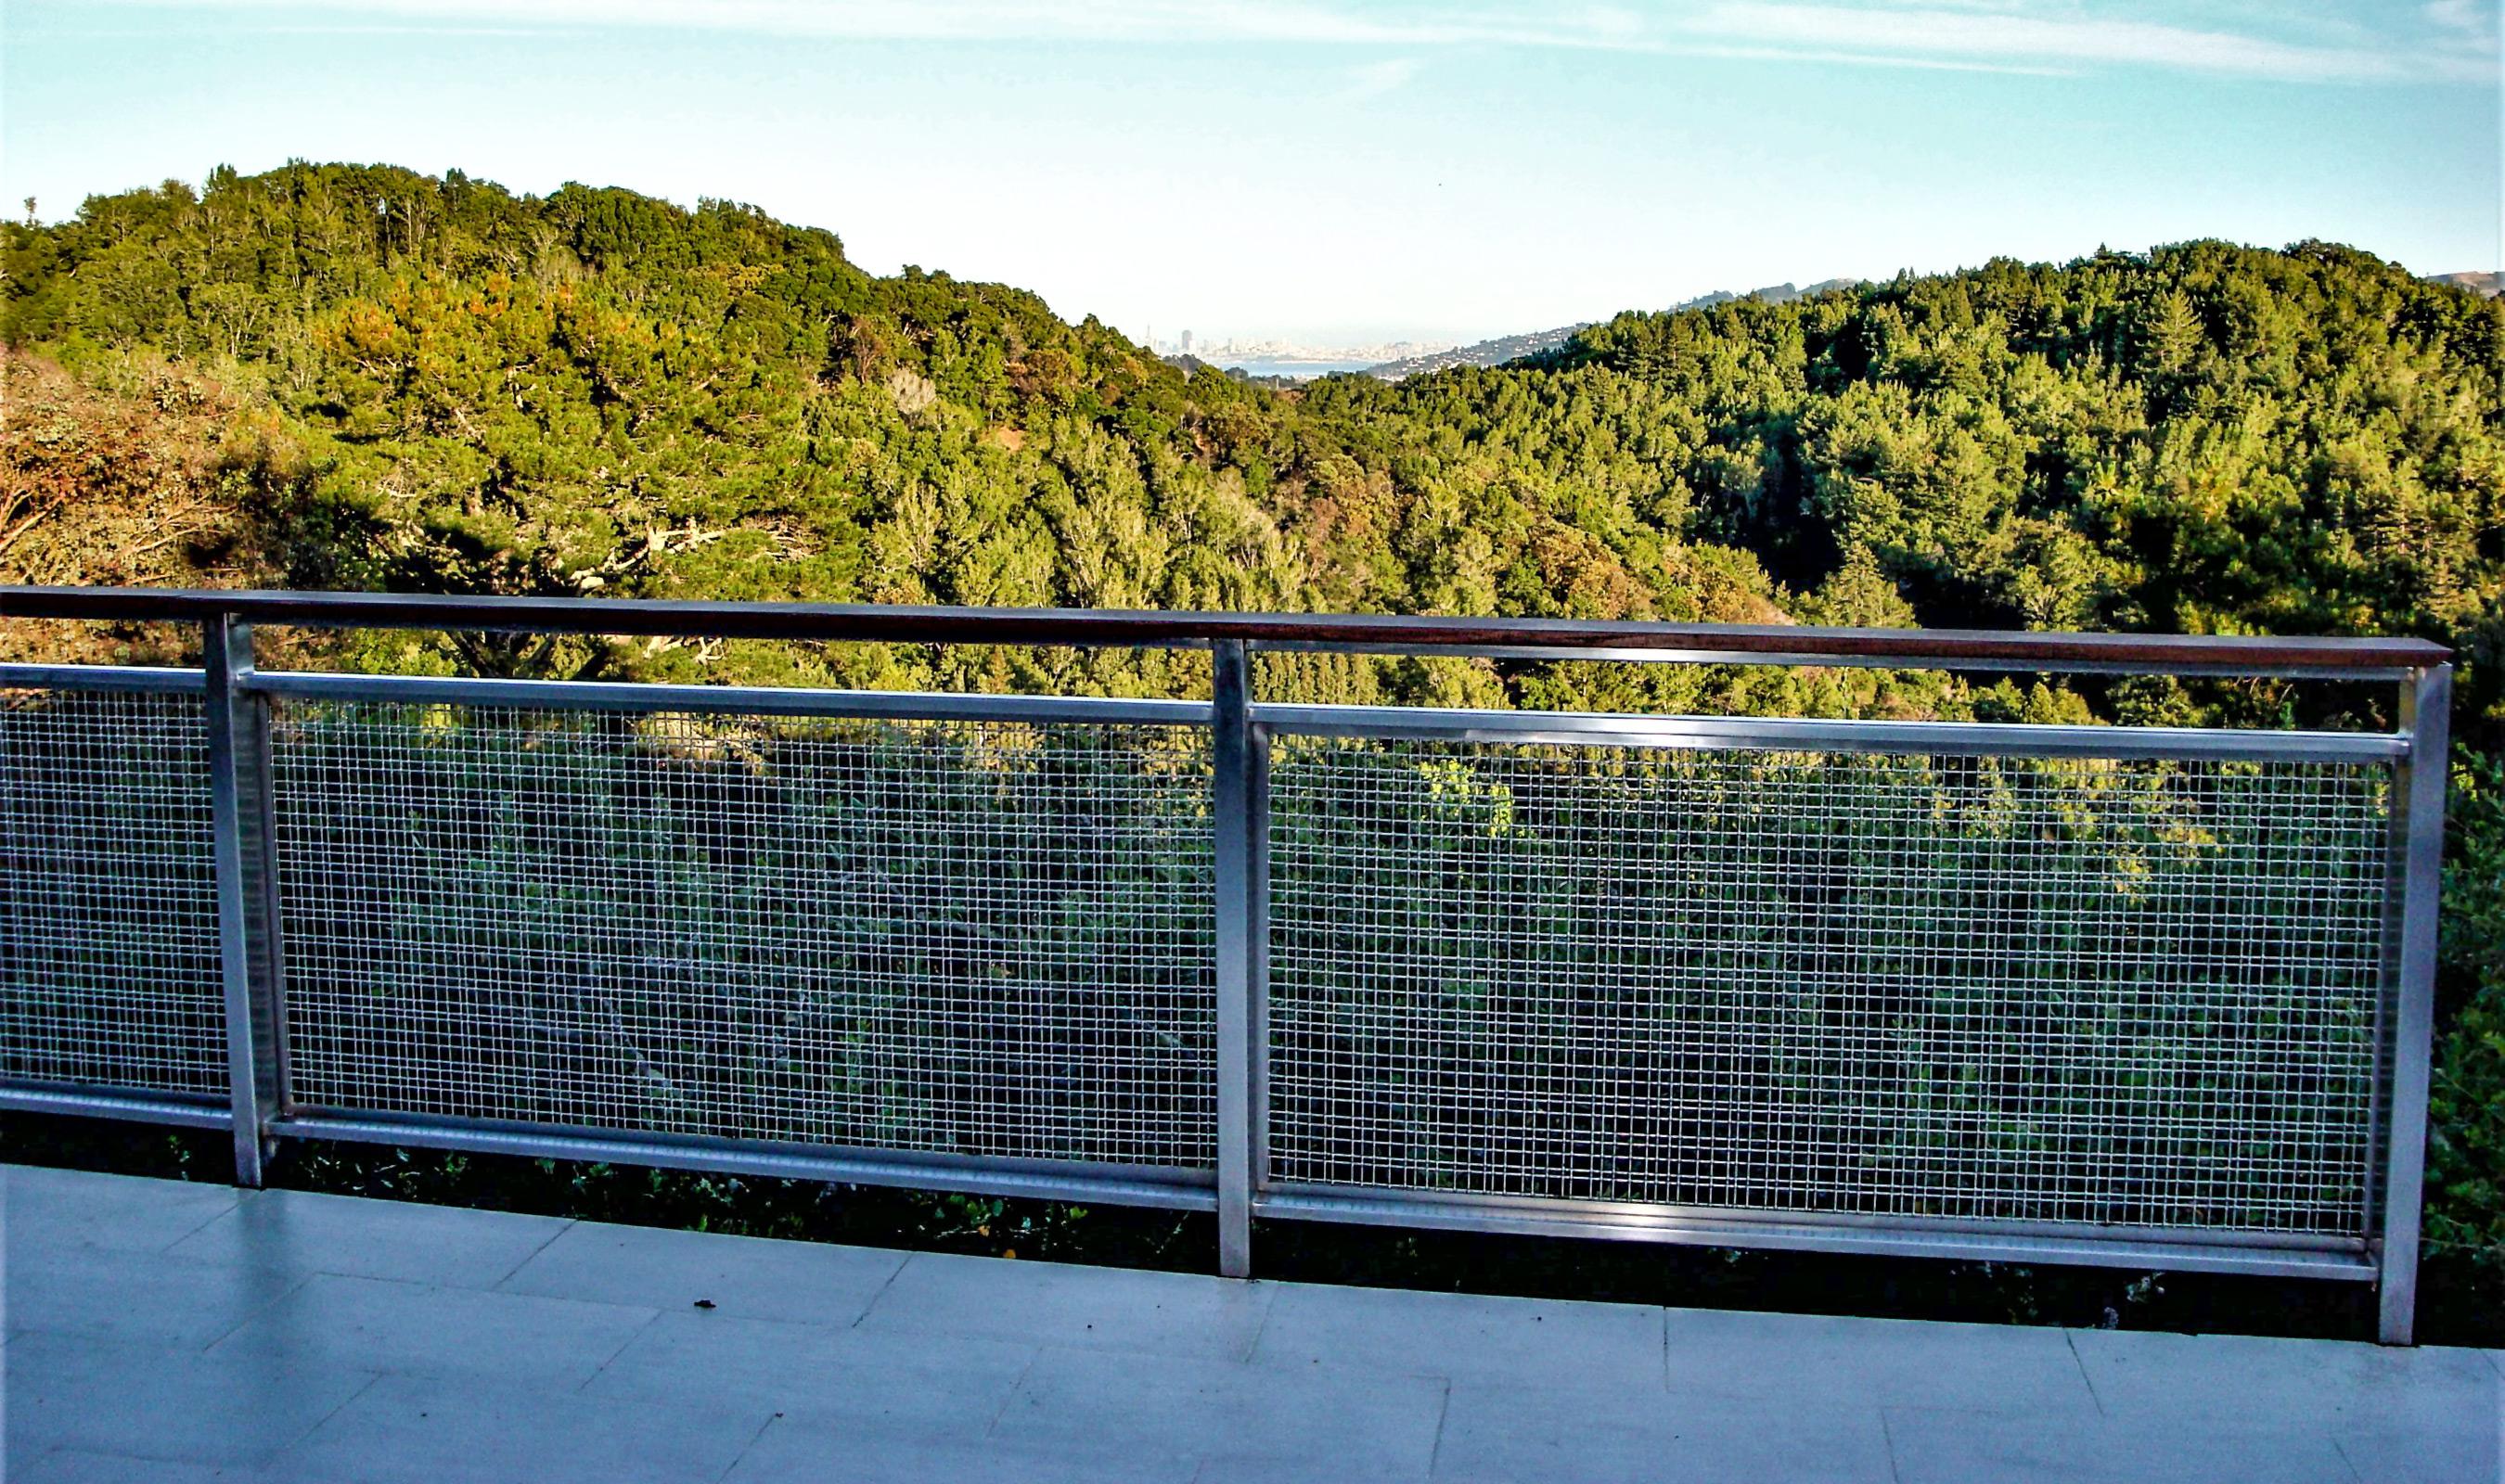 SJD-2 stainless steel deck railing infill panels